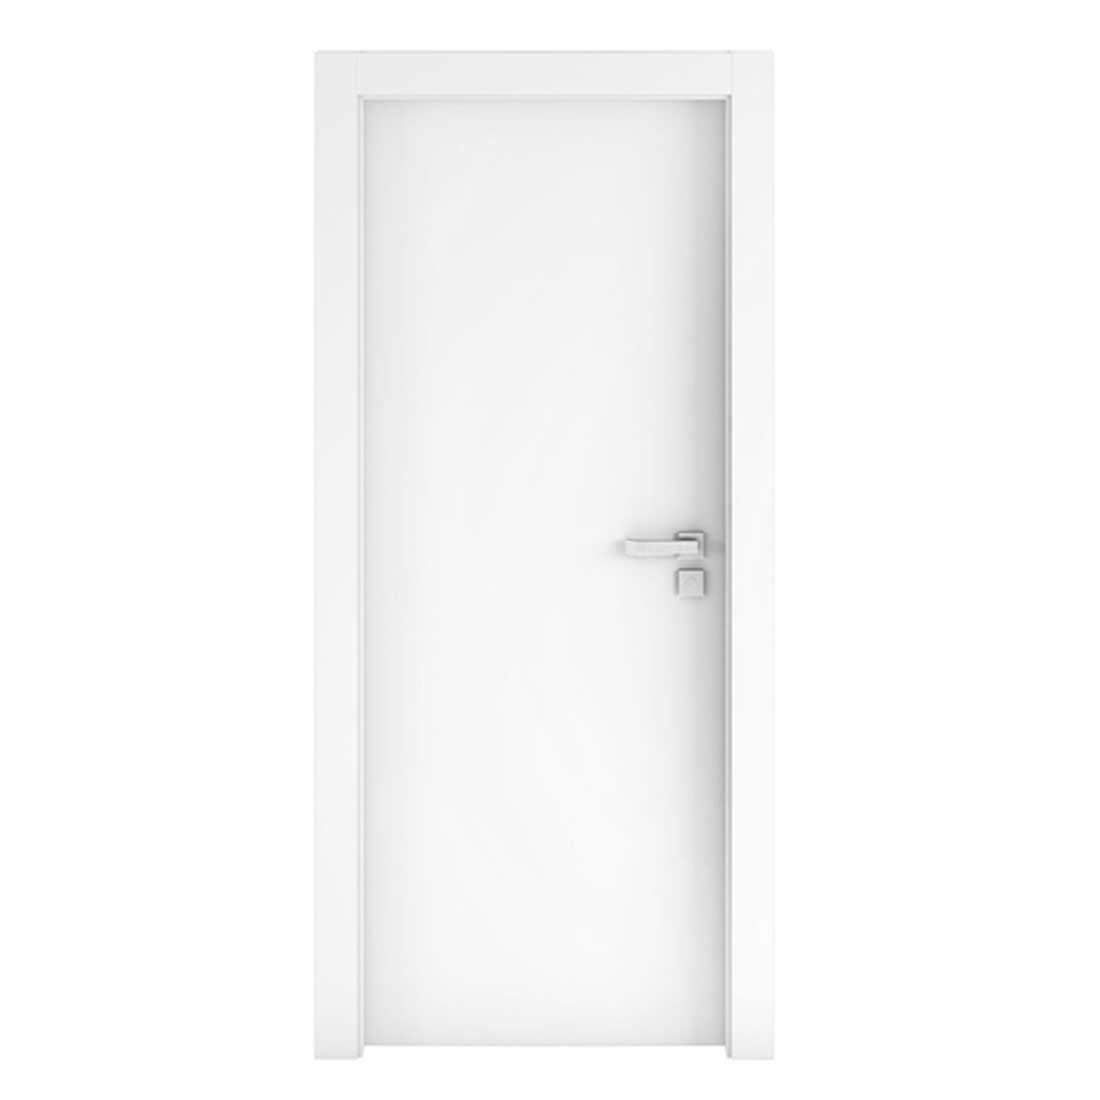 Kit Porta Concrem Wood 2,10 x 0,90 x 3,5 cm Esquerda Branca